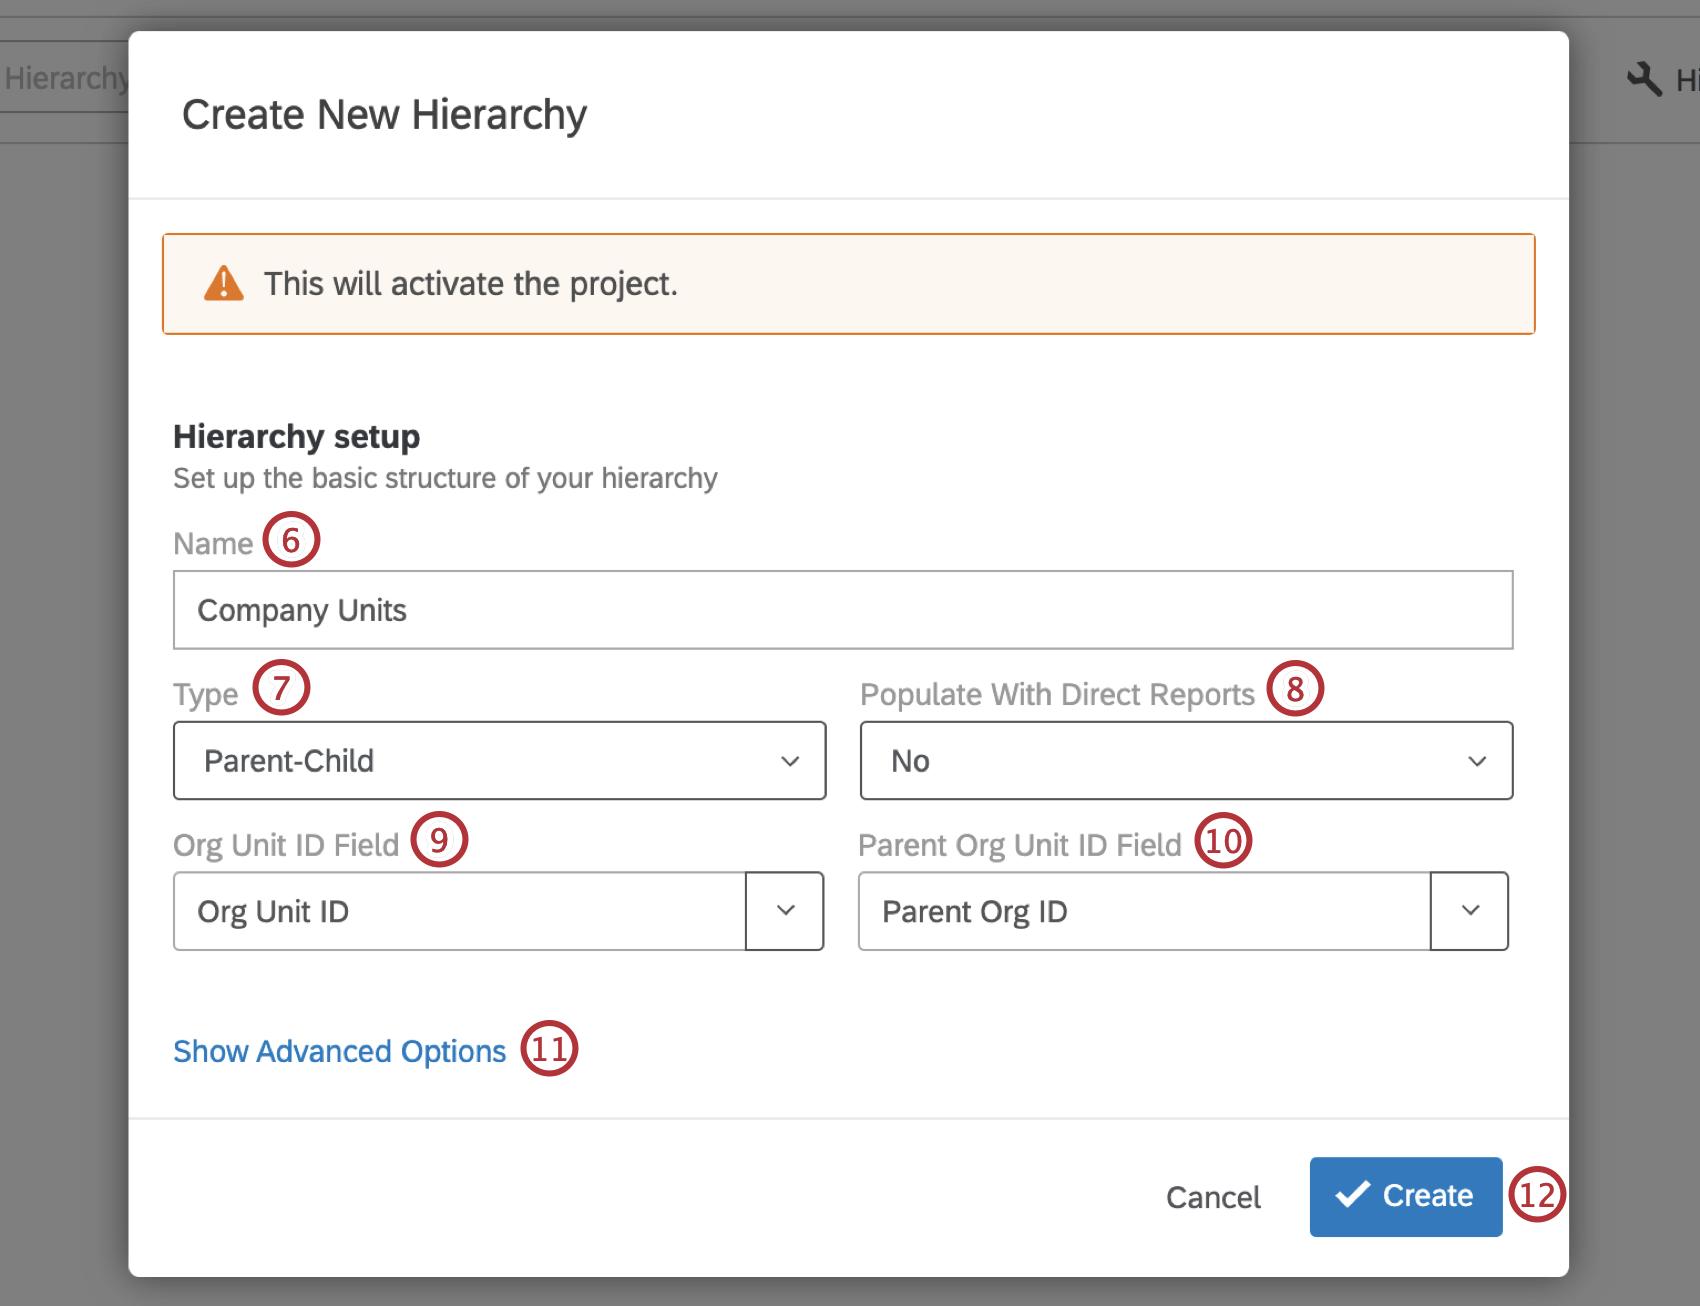 Create New Hierarchy window